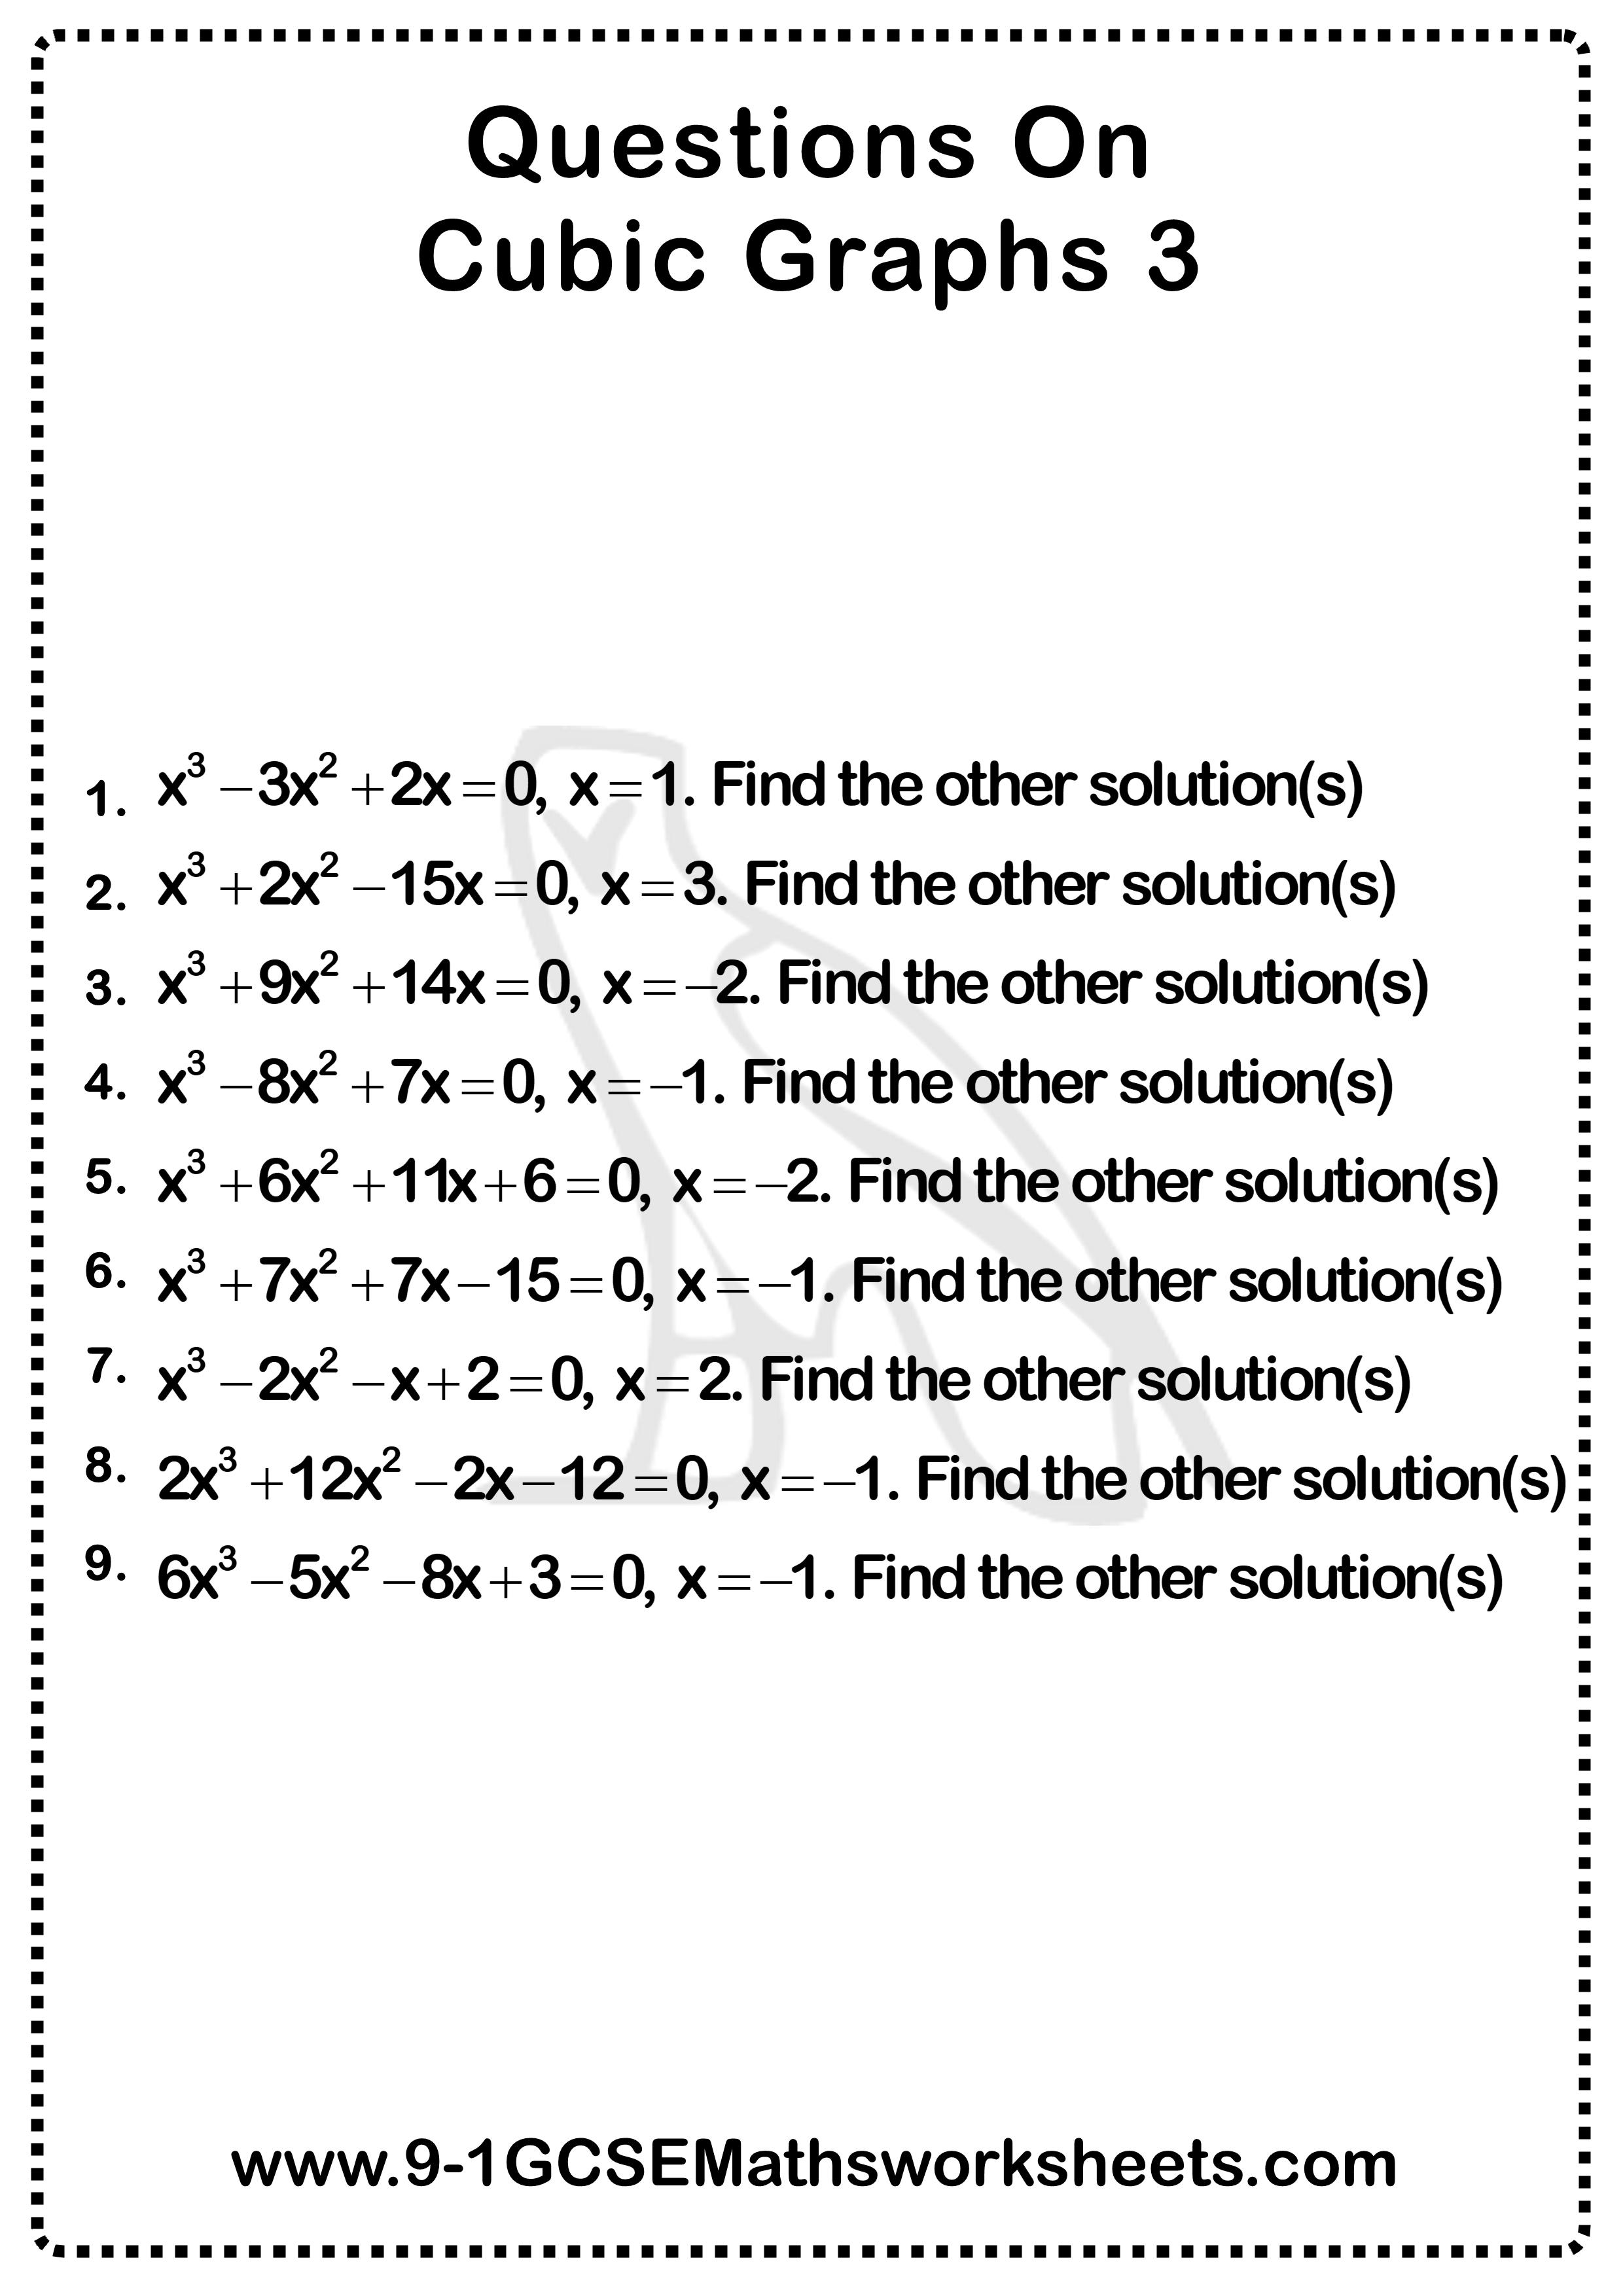 Cubic Graphs Worksheet 3